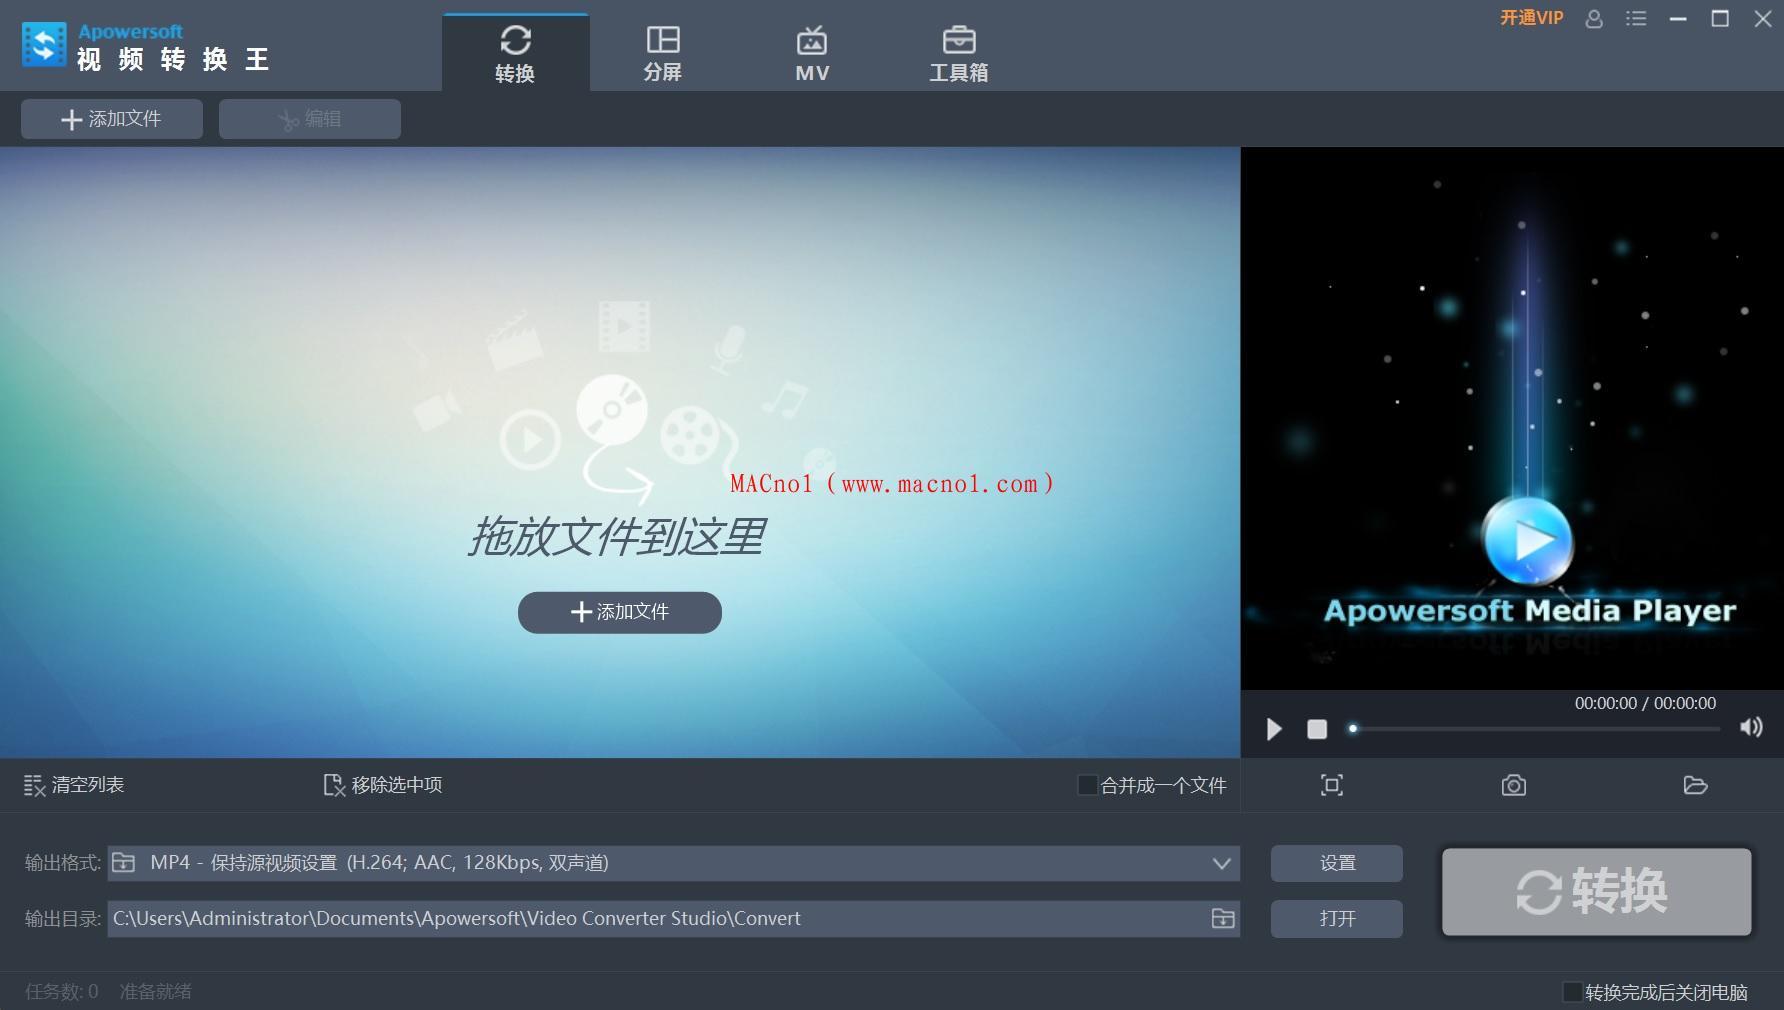 Apowersoft Video Converter(傲软视频转换王)v4.8.6 中文破解版